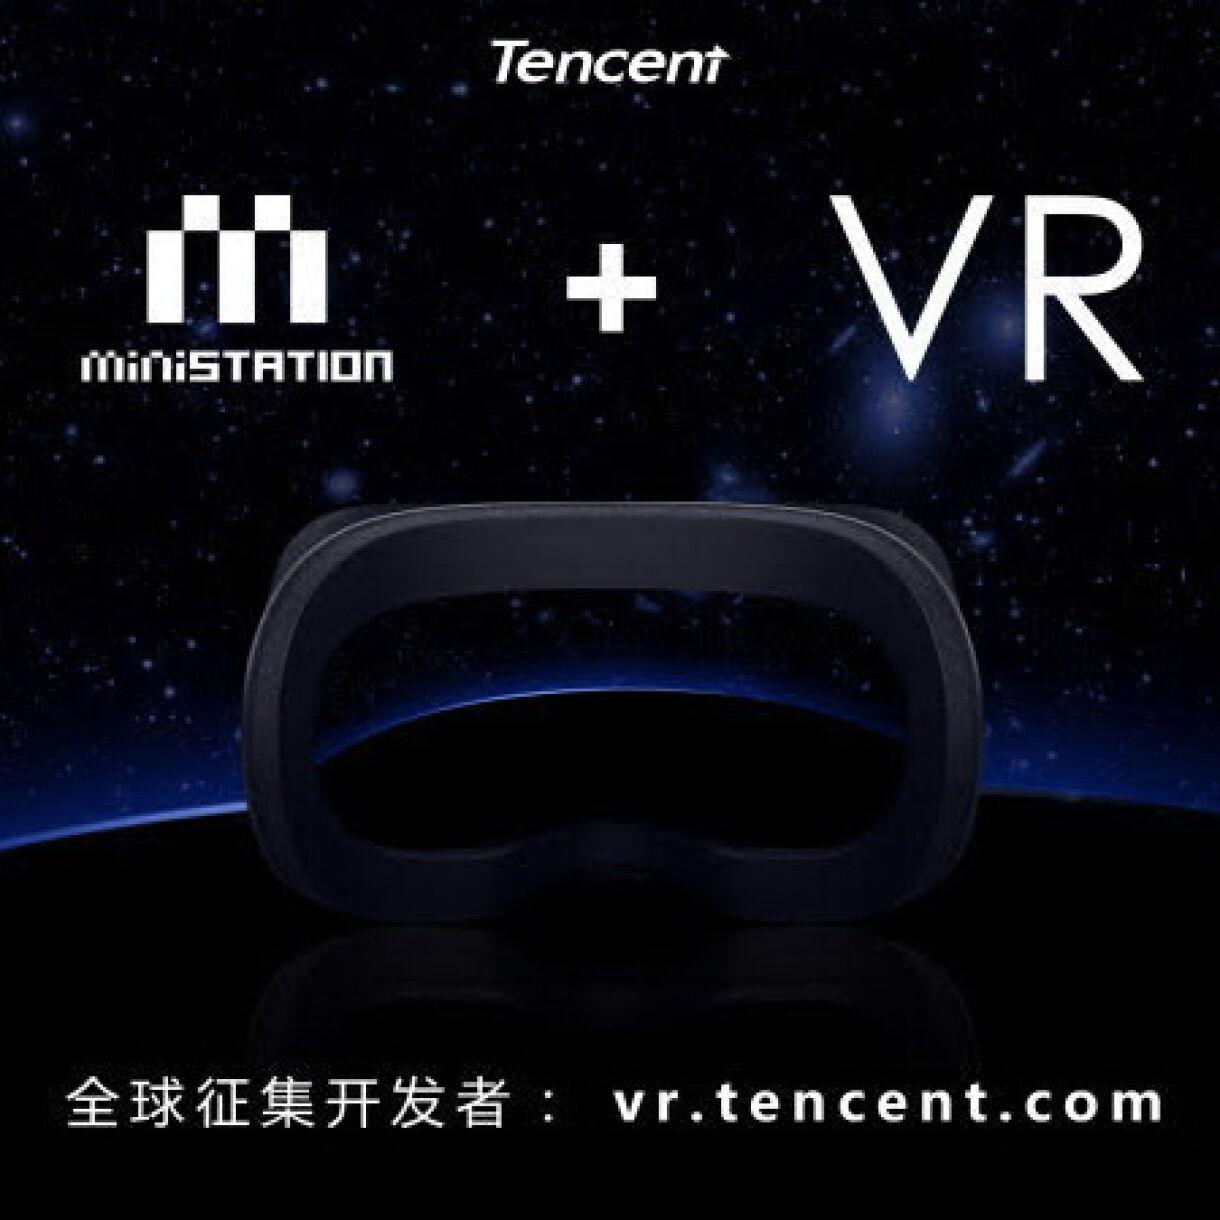 Tencent announced VR platform & a VR game